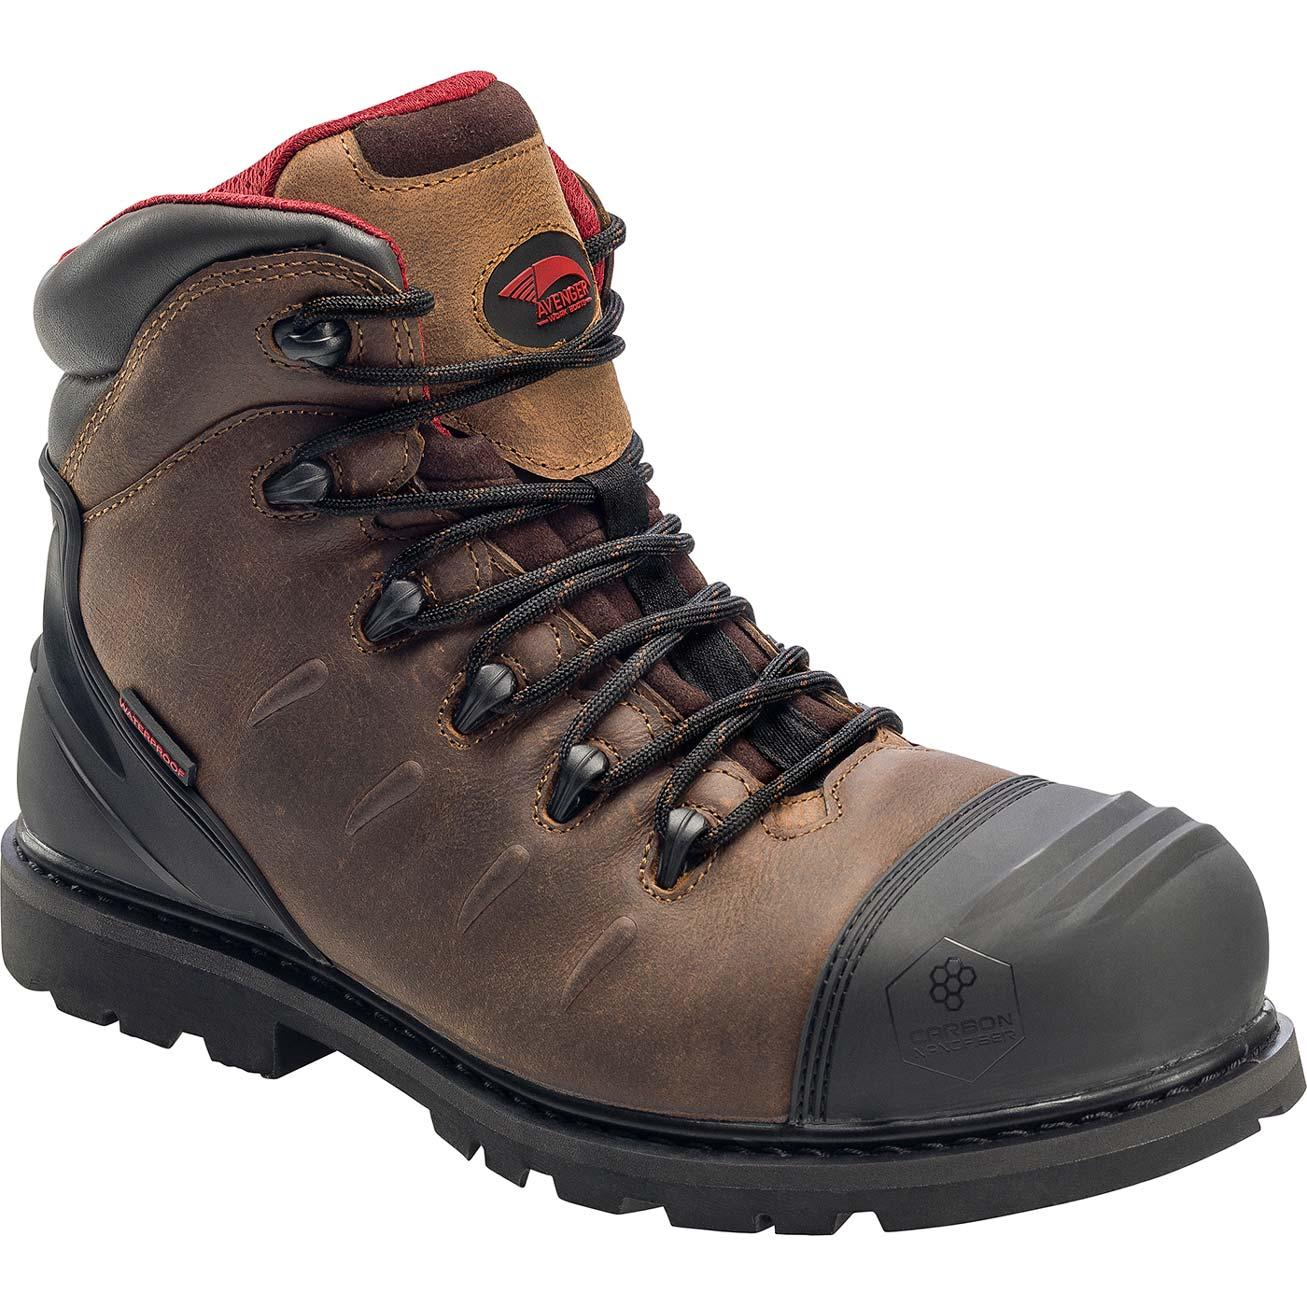 Carbon Fiber Safety Toe Shoes